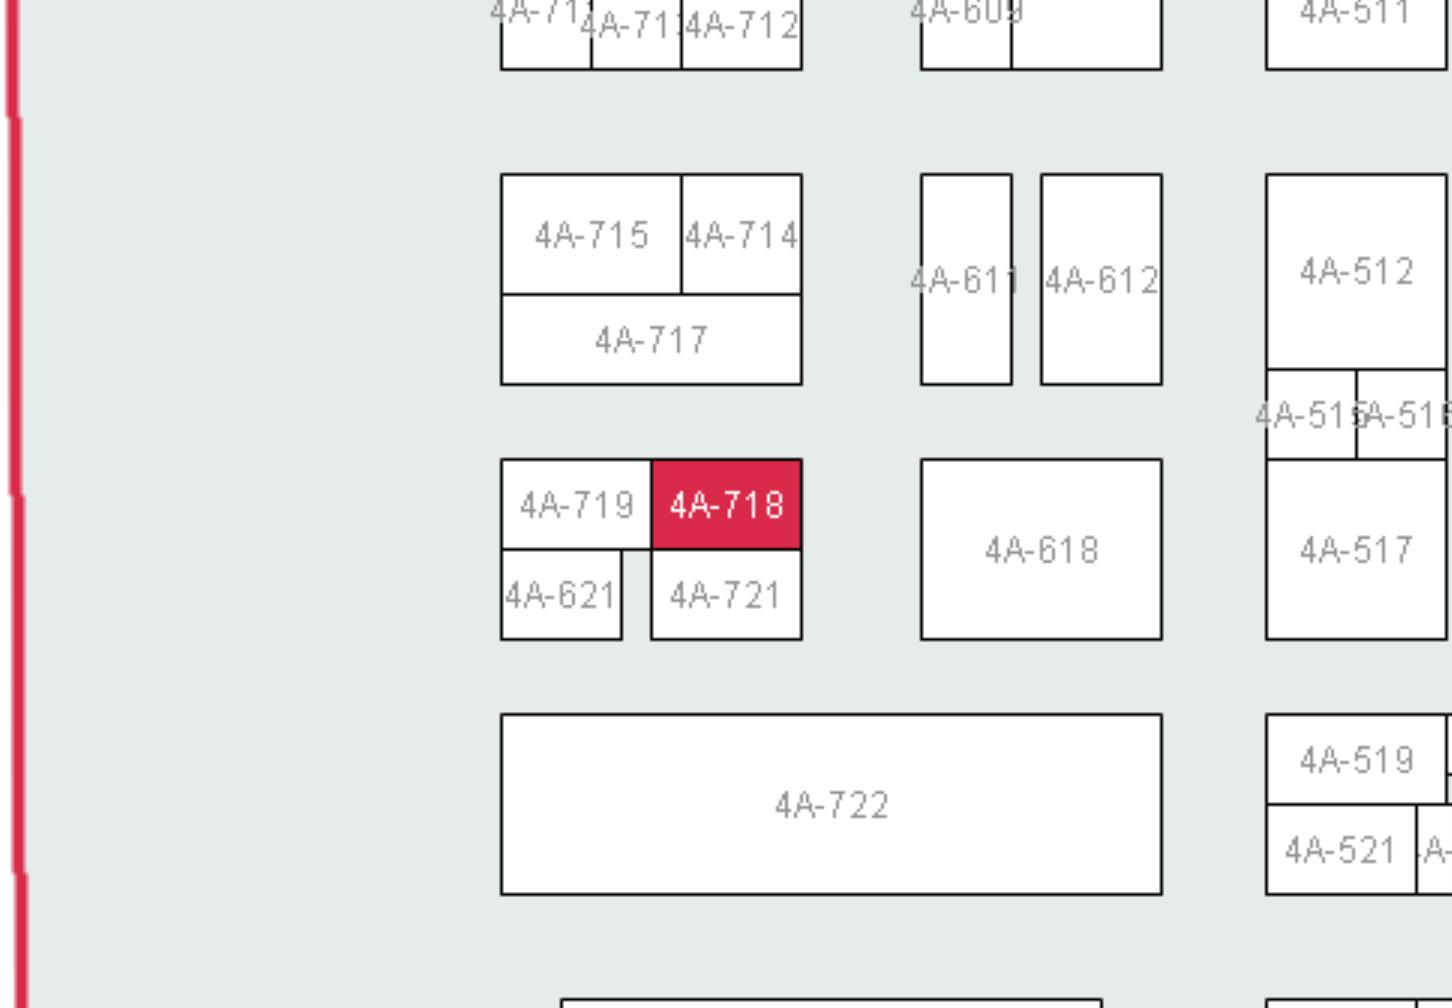 4A / 4A-718